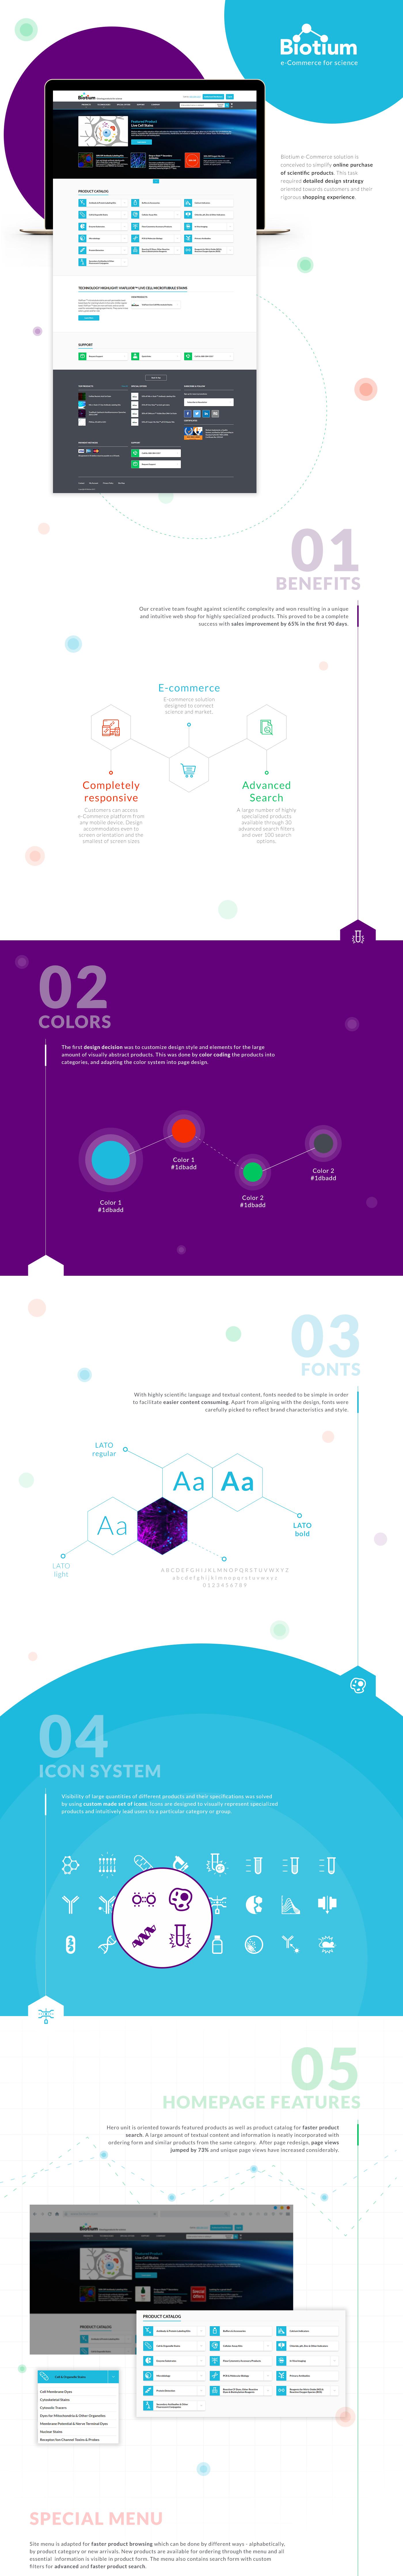 Web Design  icons science ux/ui webshop identity color Web Ecommerce usa